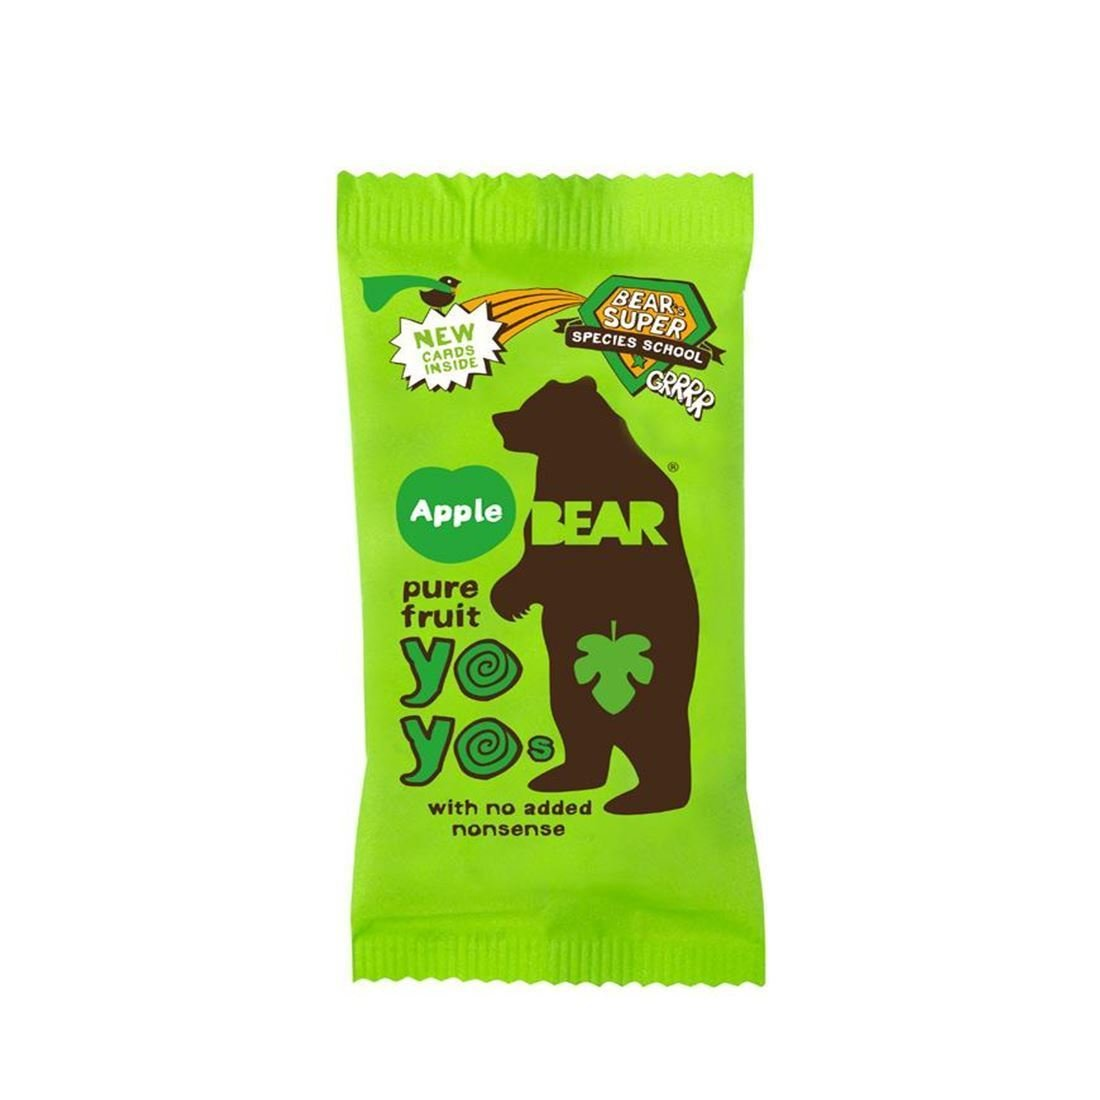 Bear | Yoyo Pure Fruit Rolls - Apple | 6 x 20g (UK)